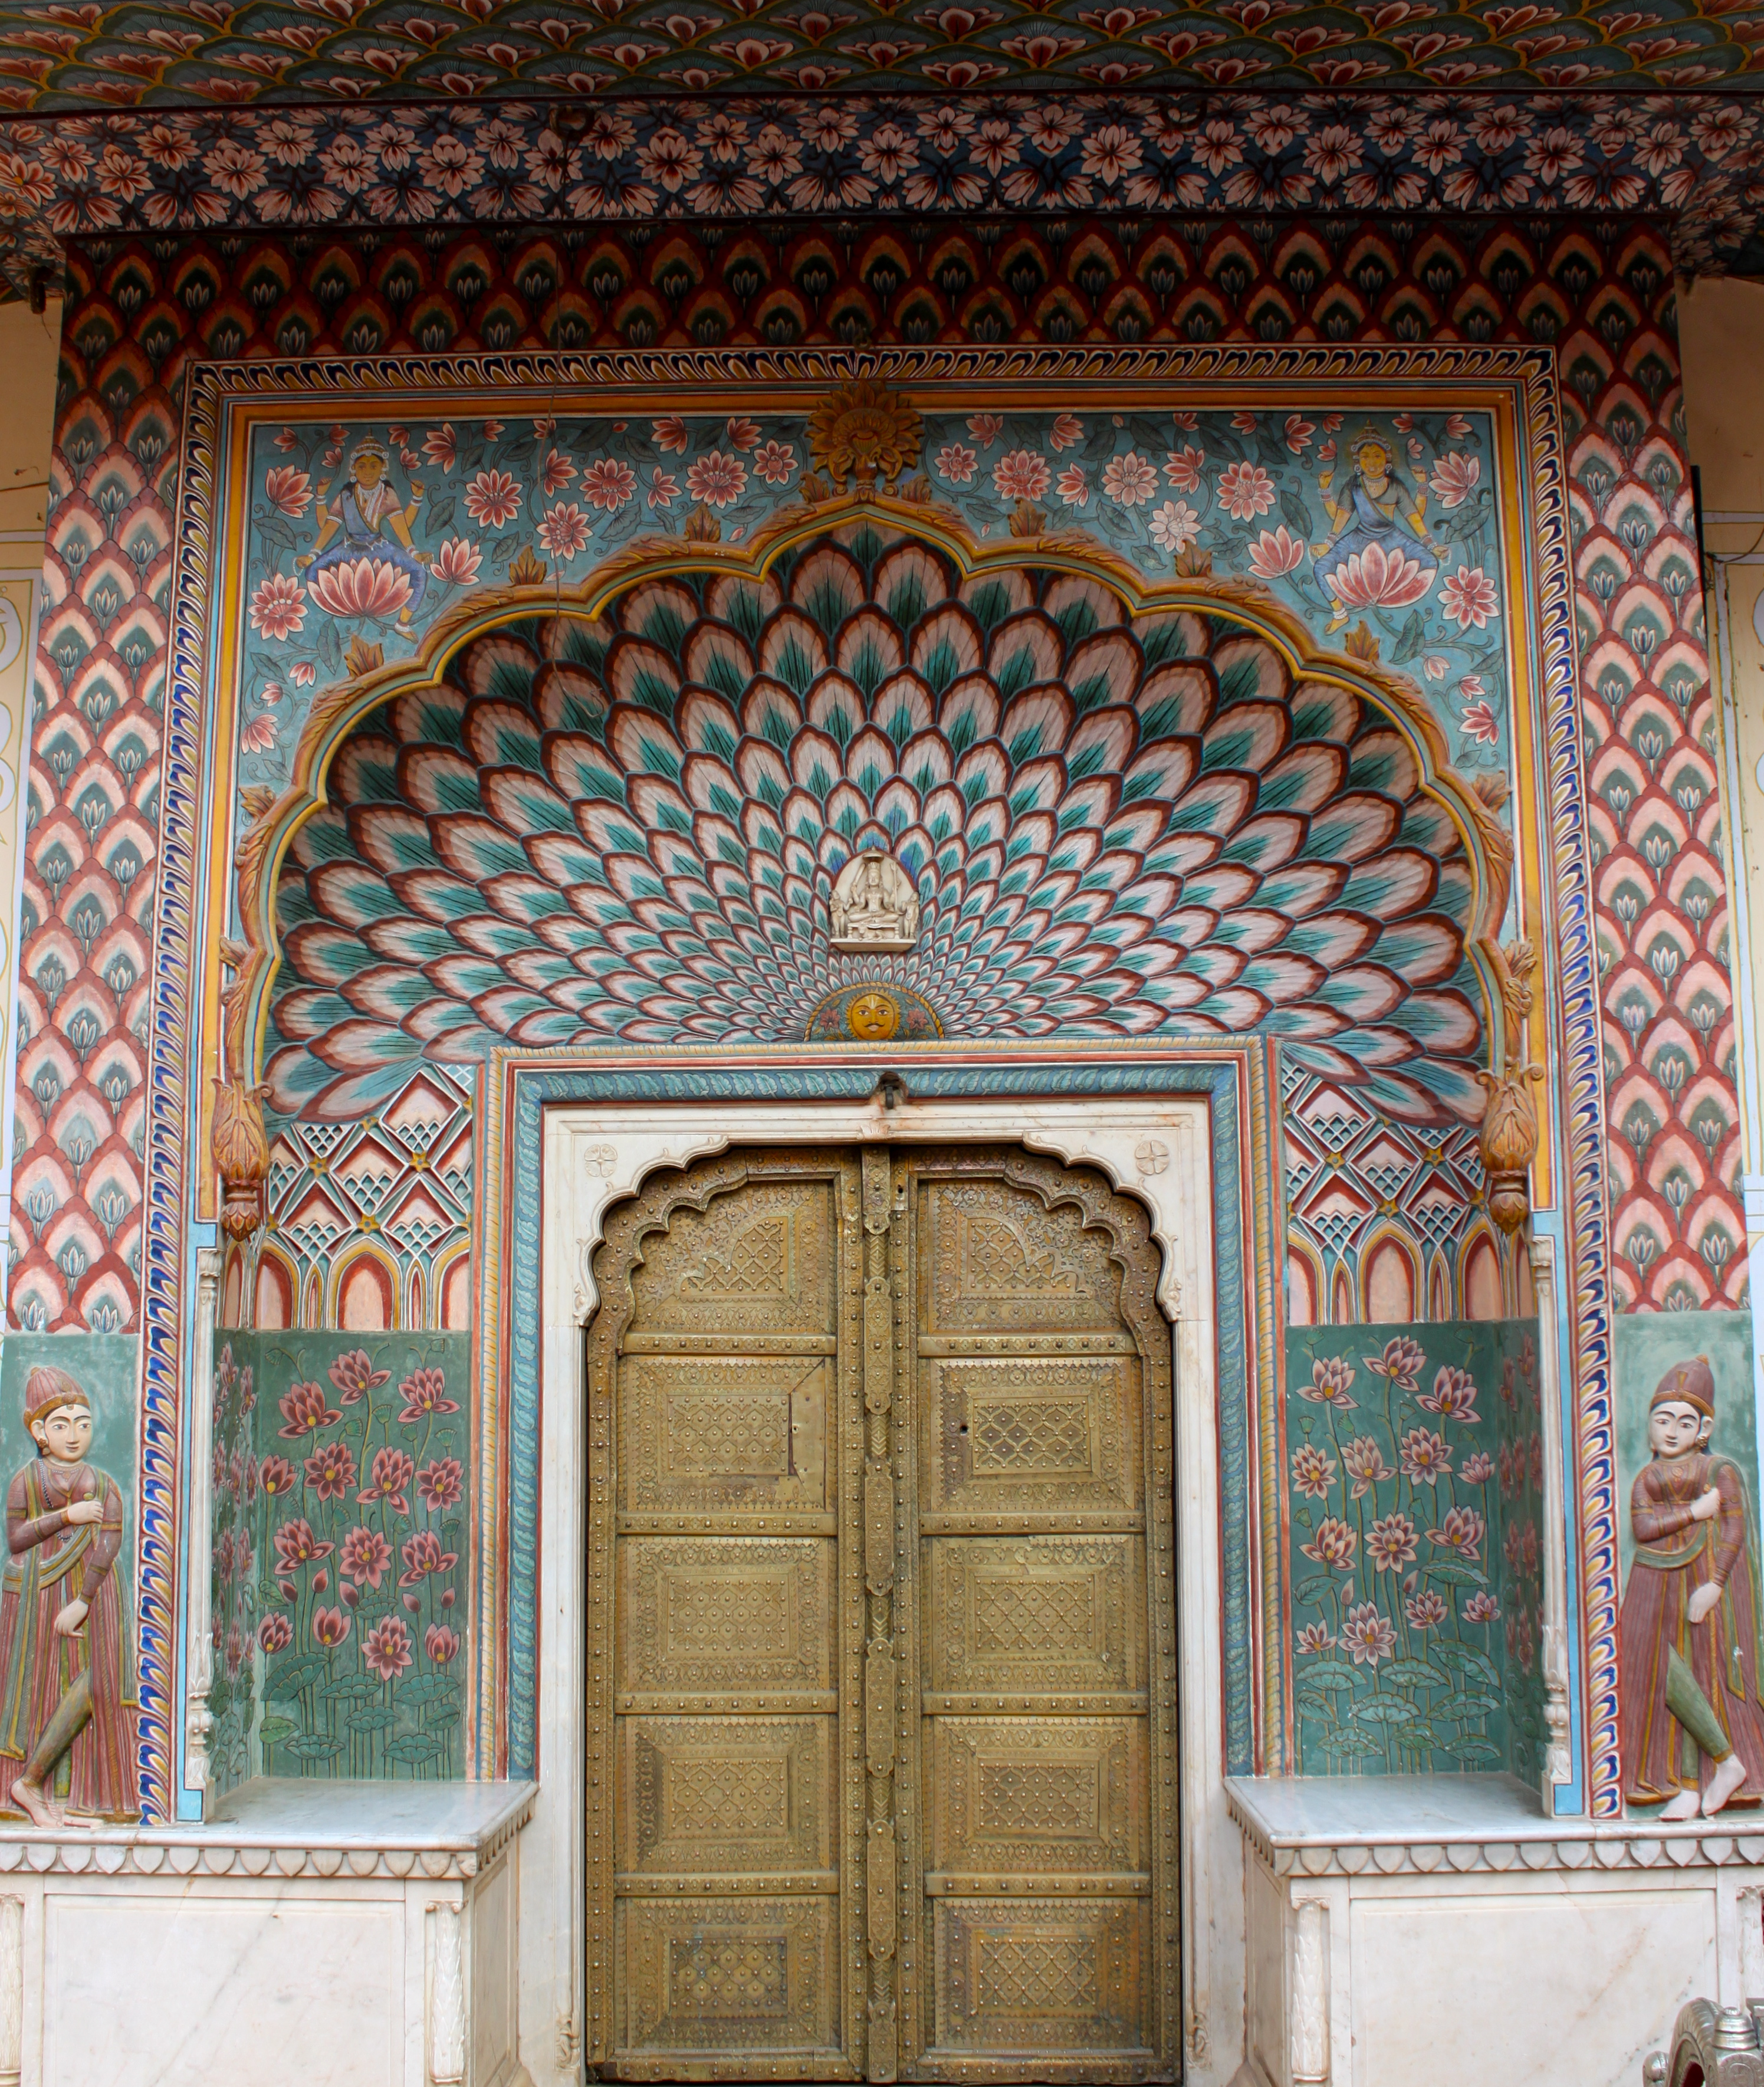 City Of South Gate >> File:SE Gate, Pritam Niwas Chowk, City Palace Jaipur.jpg - Wikimedia Commons